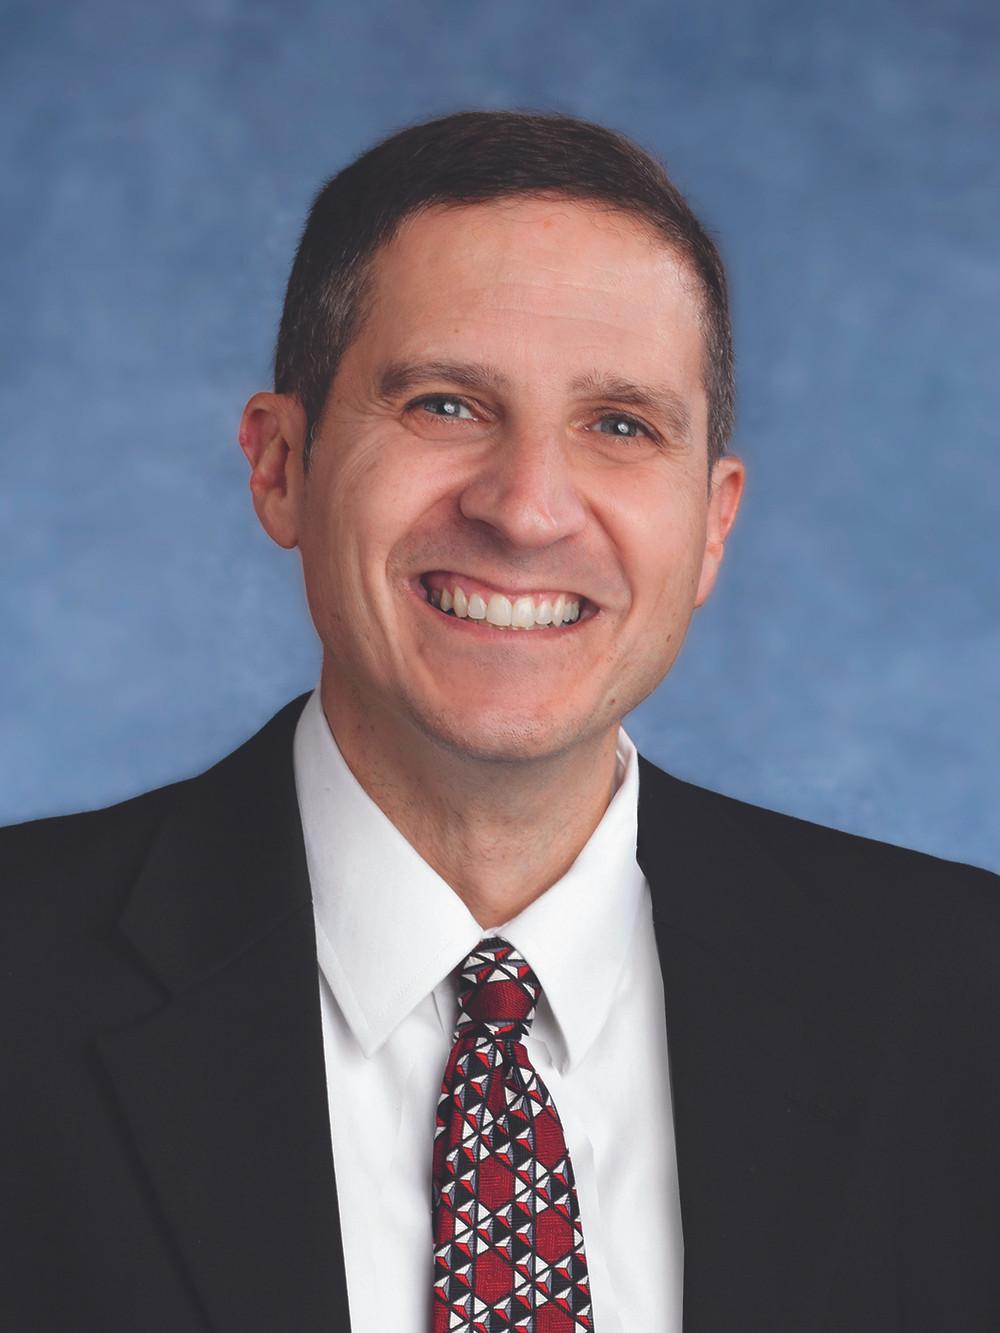 webster-csd-superintendent-abruptly-retires-after-watkins-lawsuit